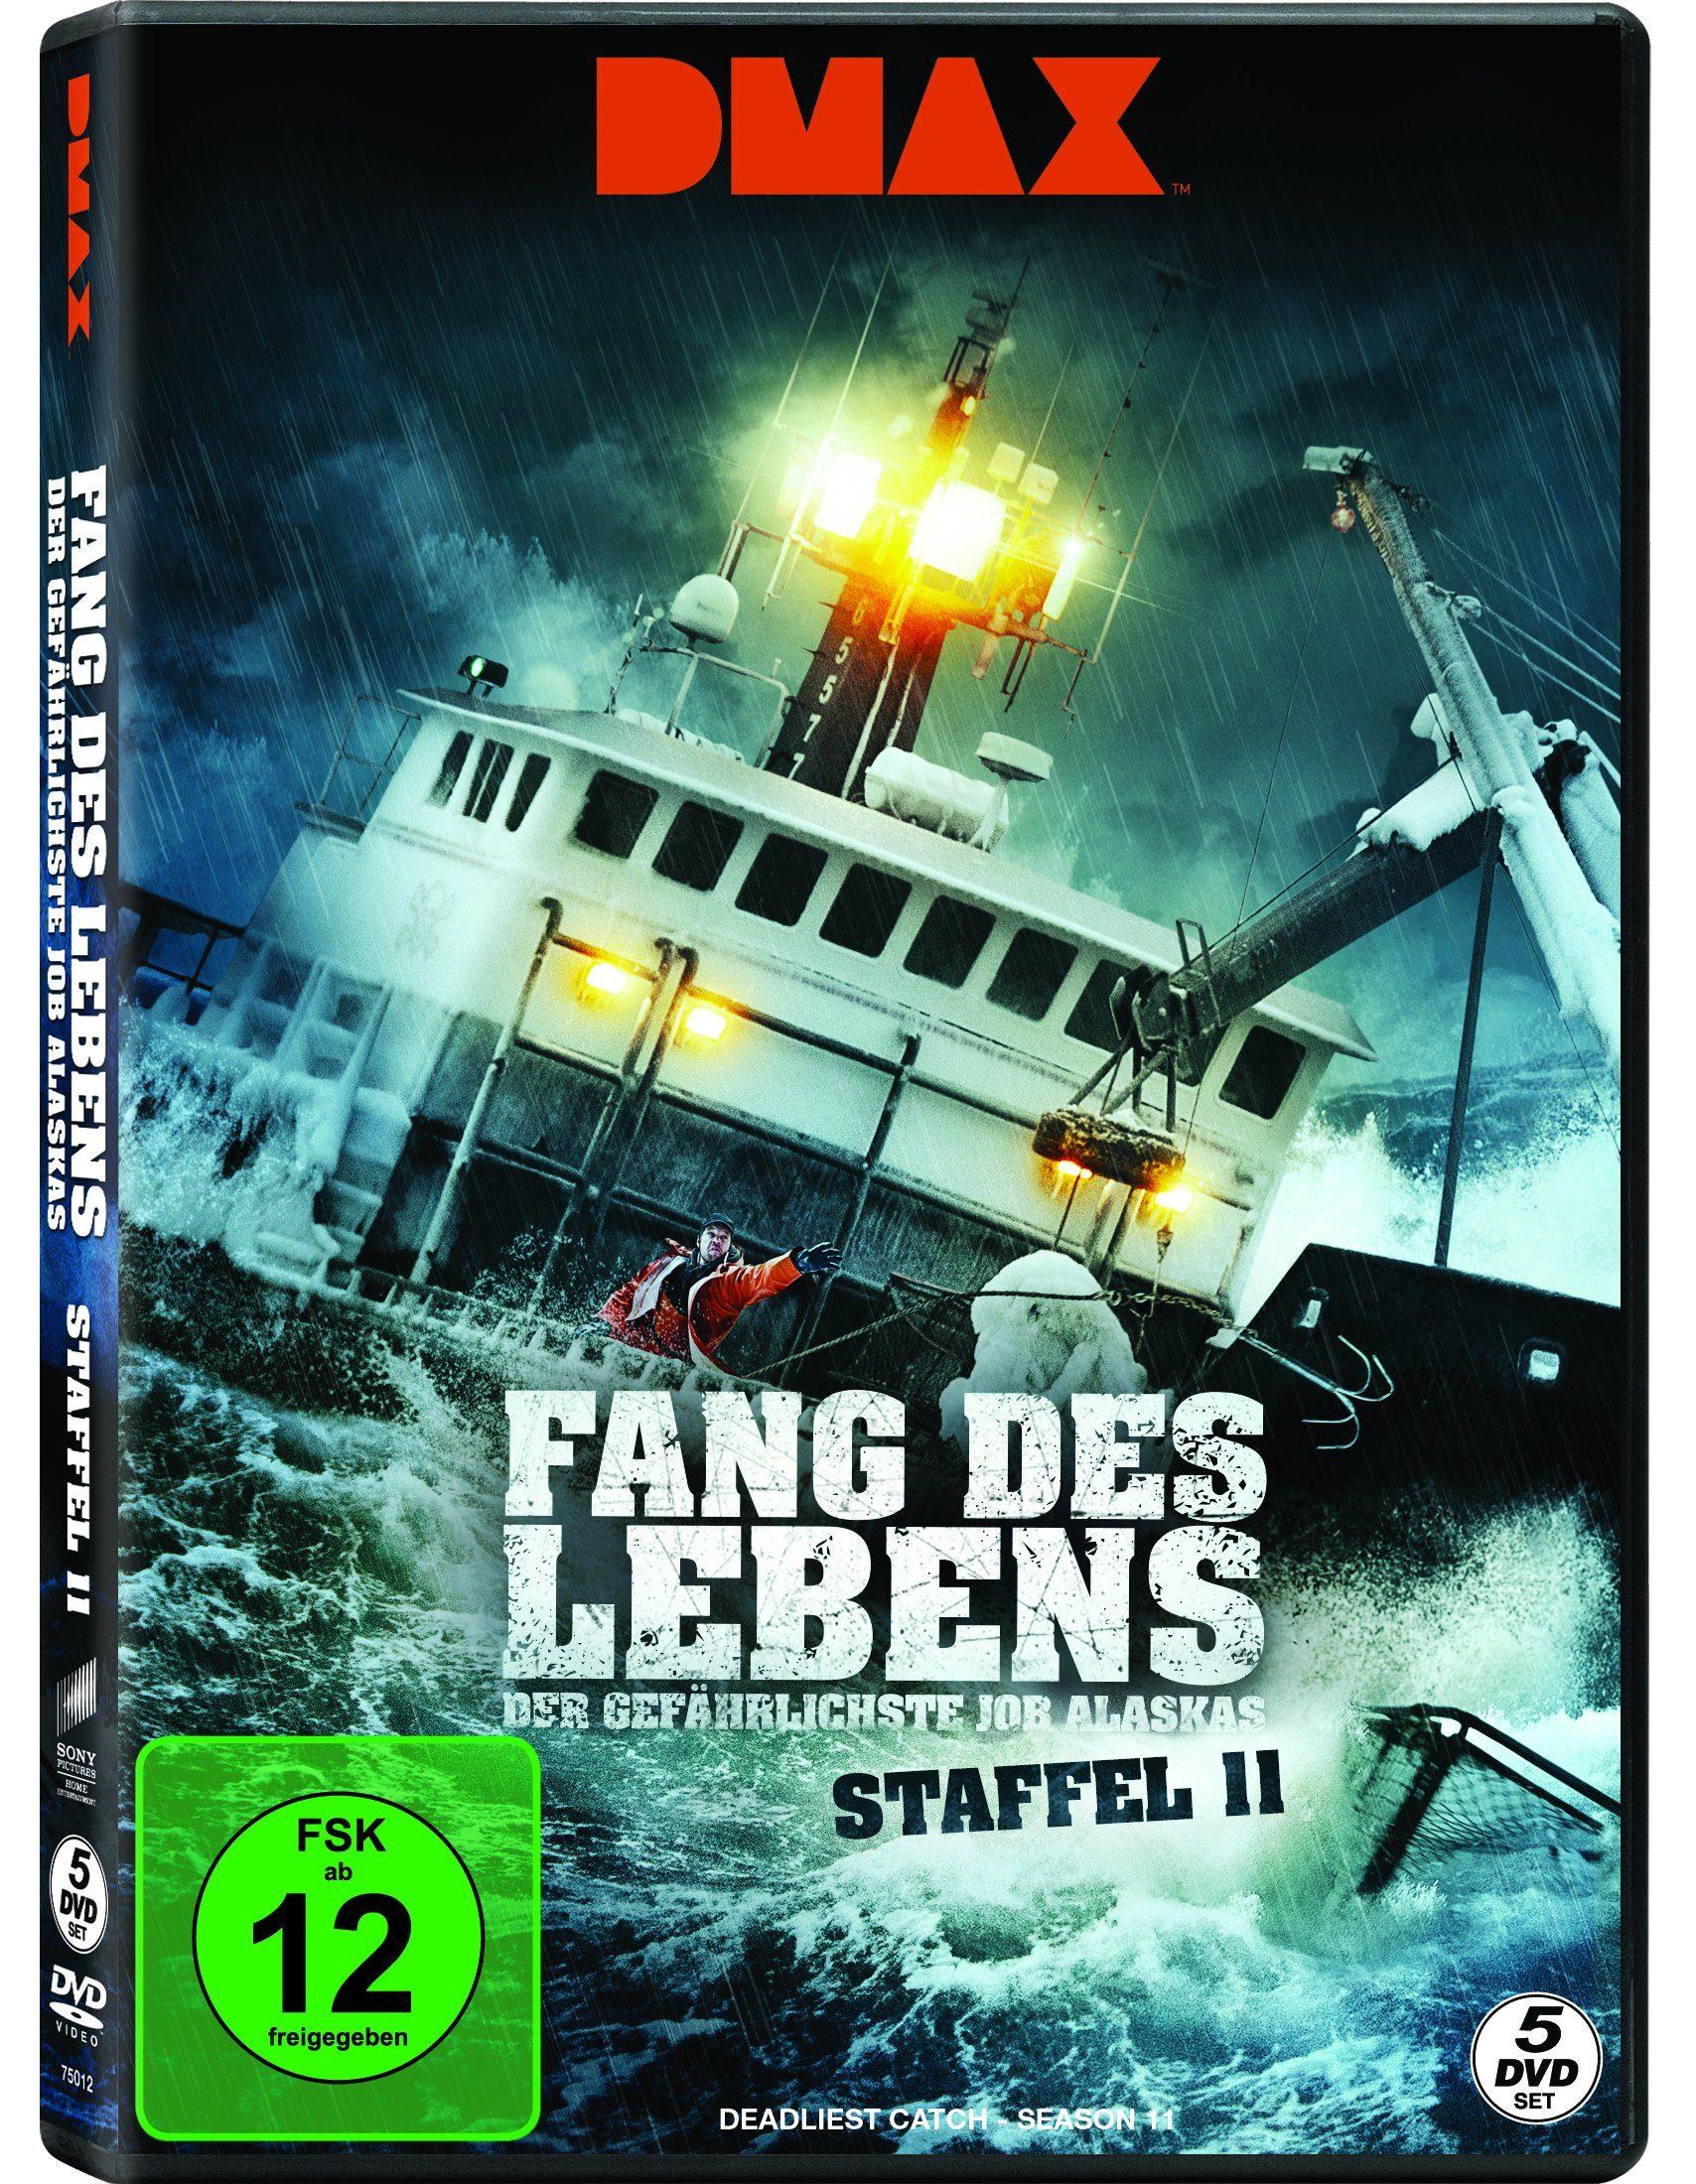 Sony Pictures DVD »Fang des Lebens Staffel 11 (DMAX - 5 Discs)«